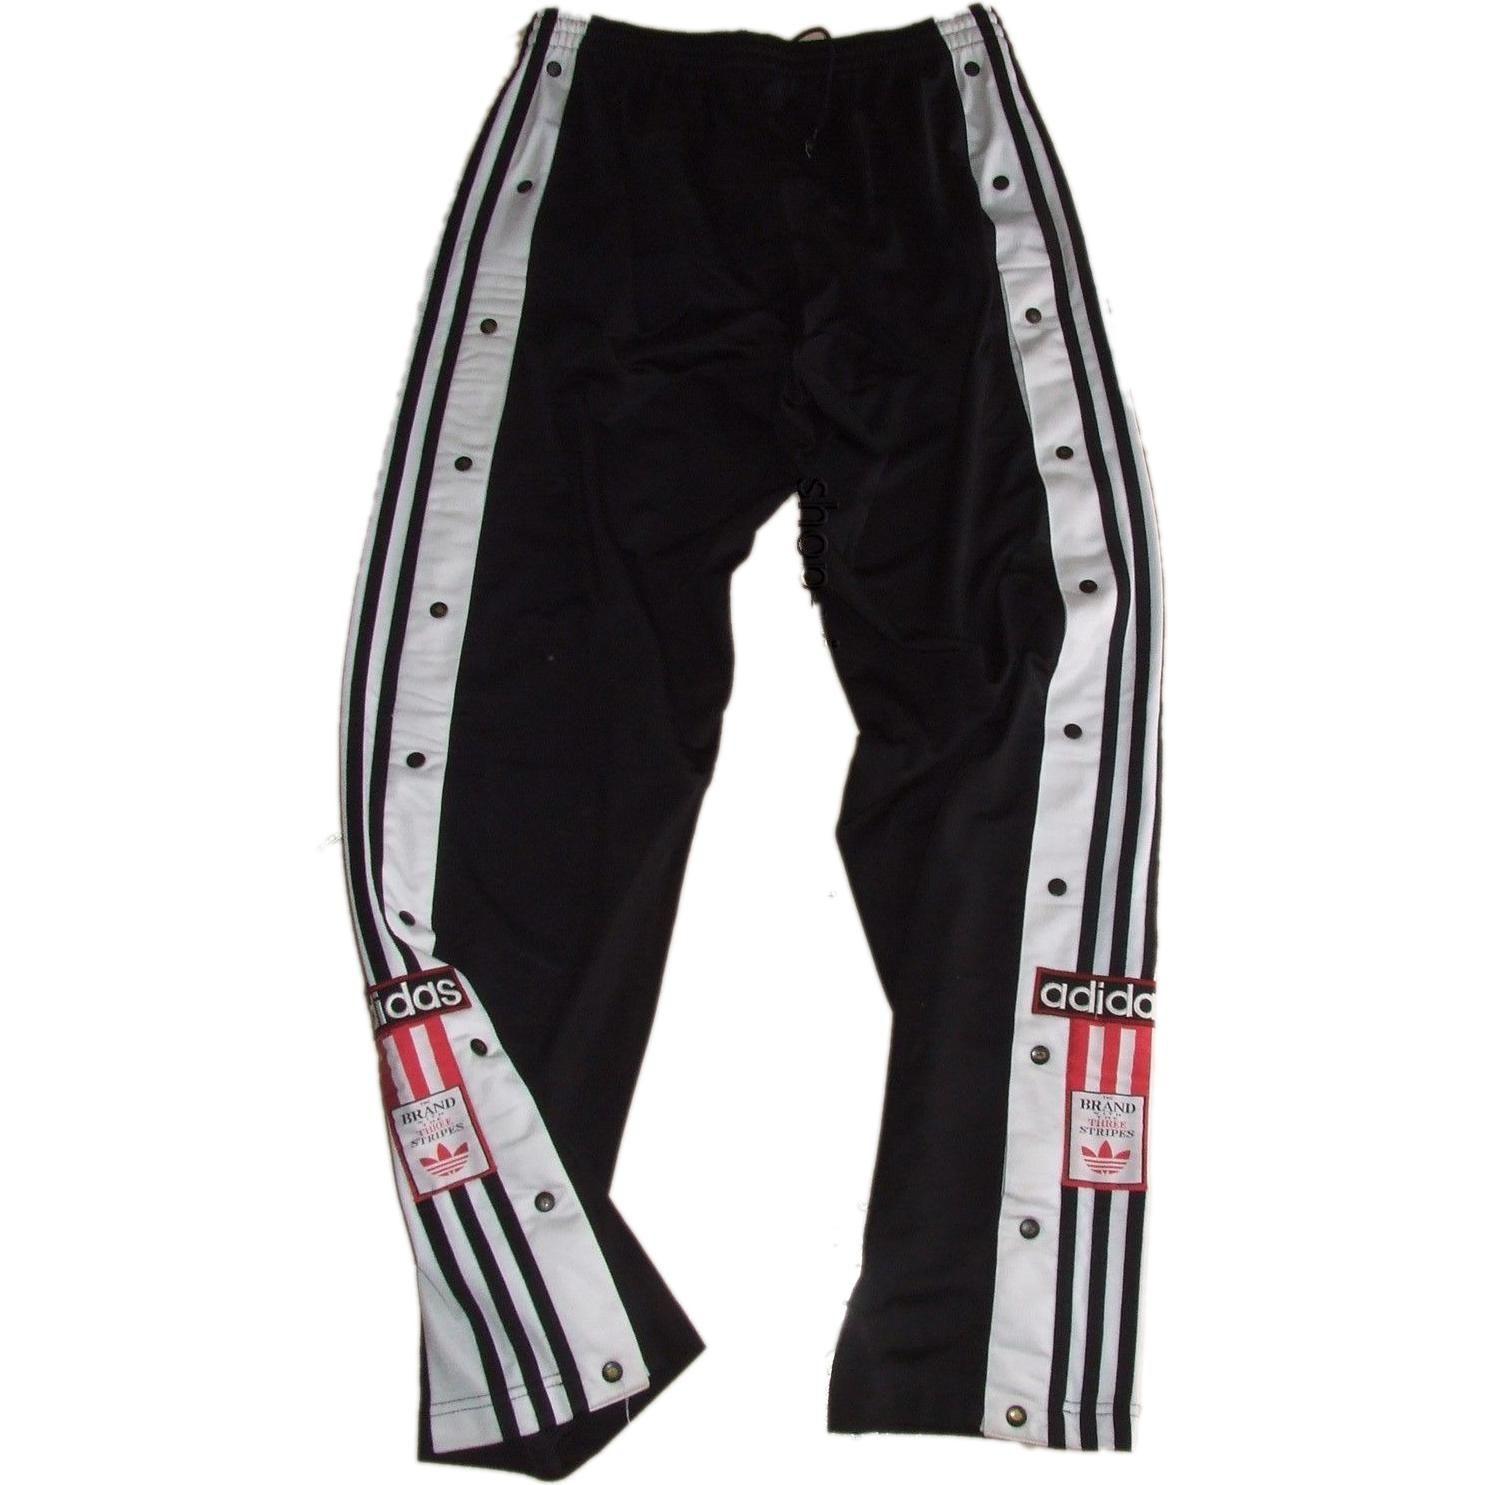 Adidas Originals Poppers Pants as seen on Kim Kardashian